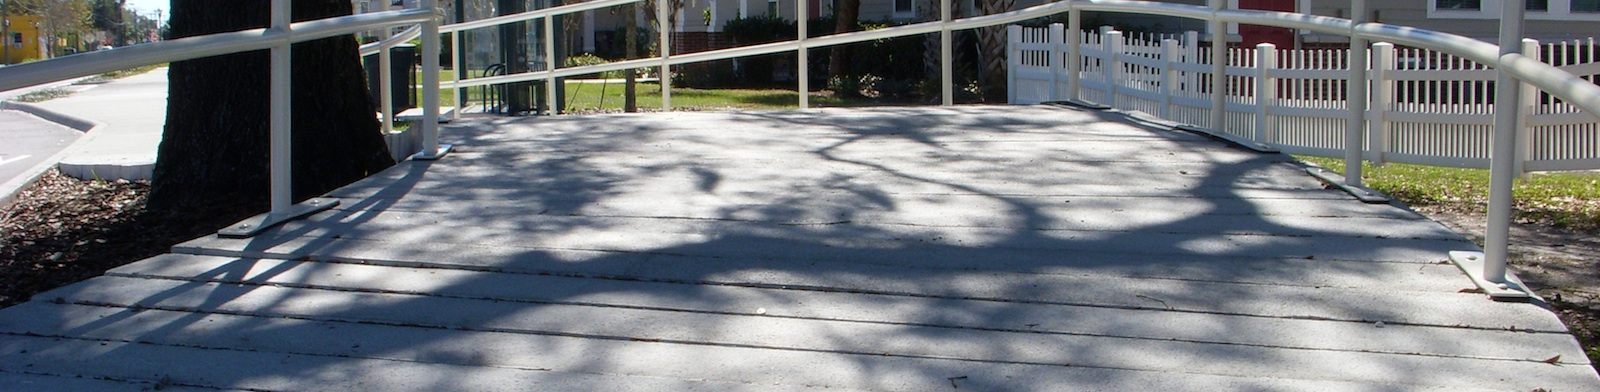 22nd Avenue Tampa FL boardwalk